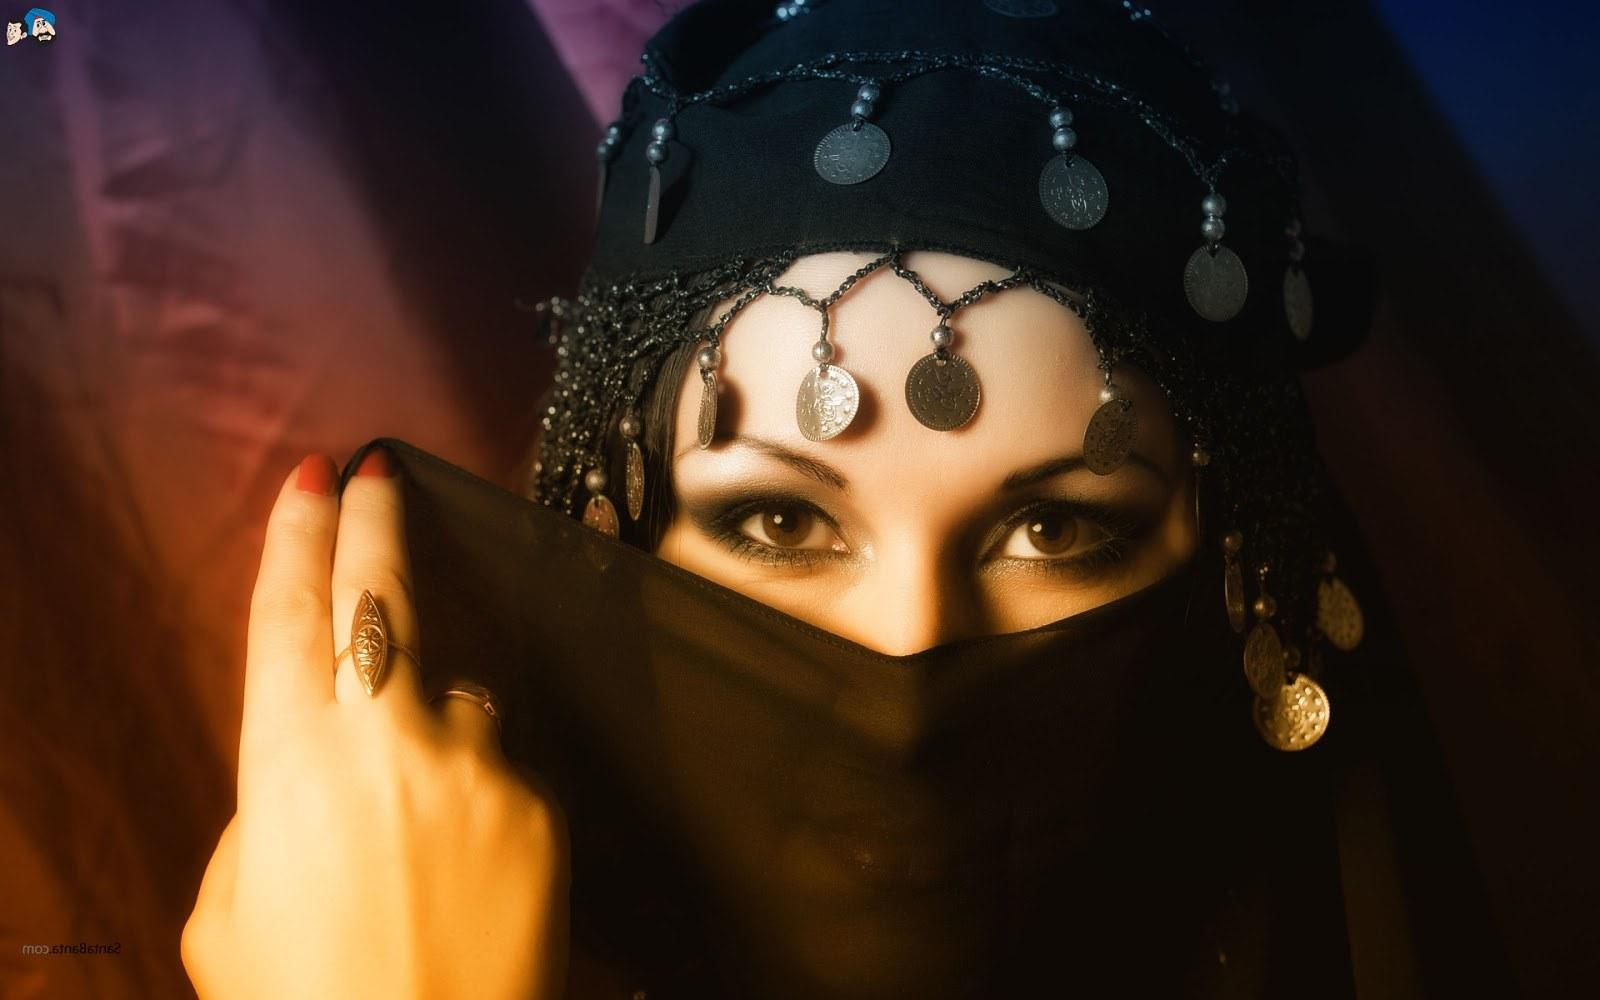 Bentuk Muslimah Bercadar Hitam O2d5 Sayyidatina Fatimah Az Zahra R Ha Bhgn 2 – Radio Ikim